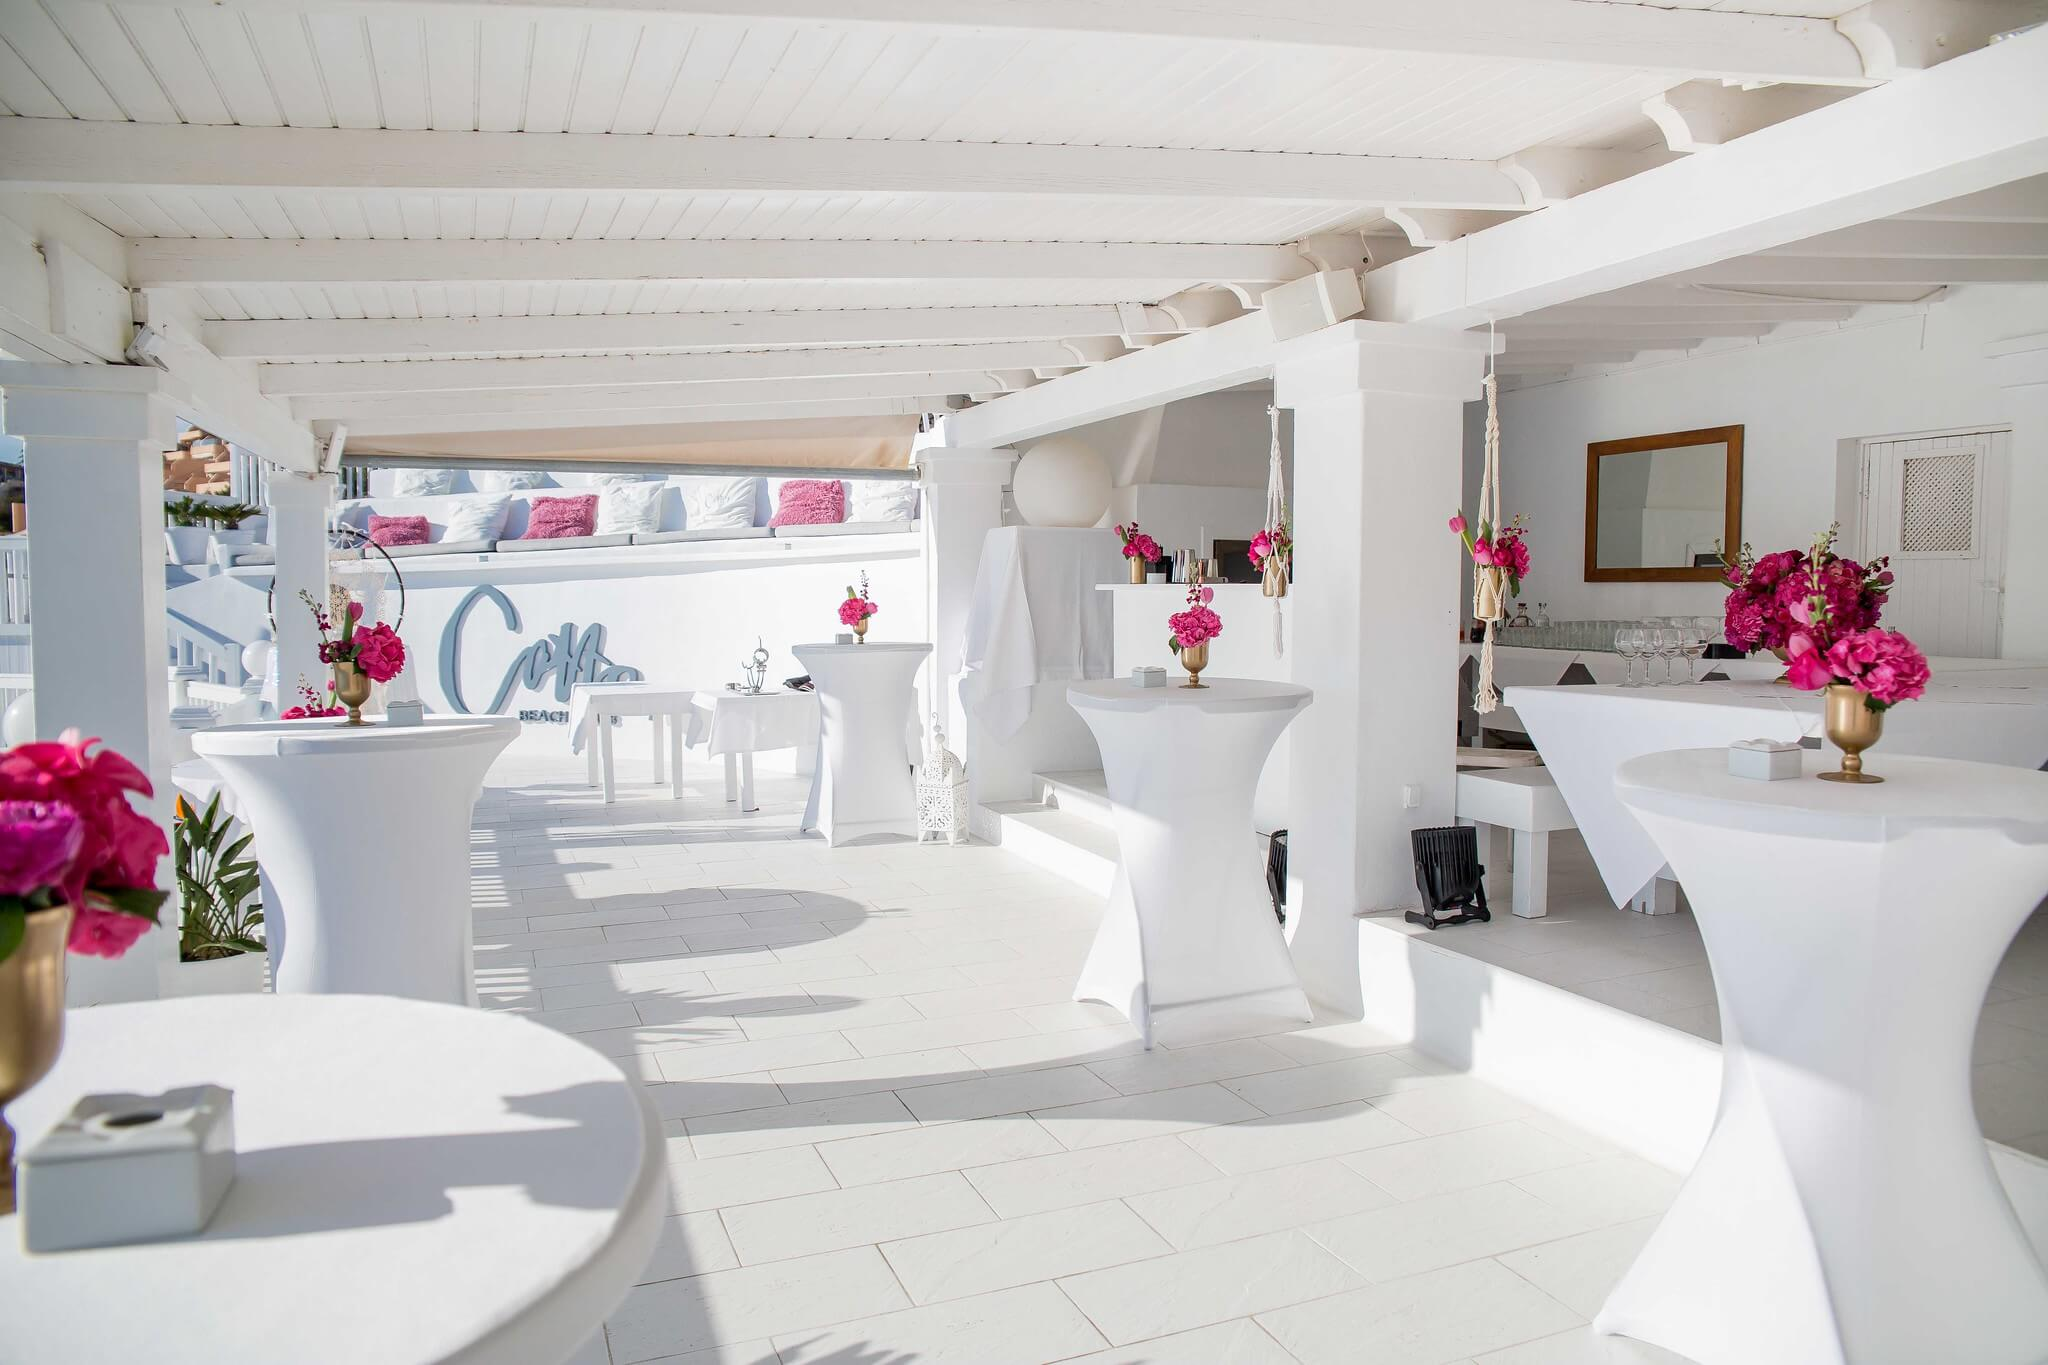 https://www.white-ibiza.com/wp-content/uploads/2020/03/ibiza-wedding-venues-cotton-beach-2020-05.jpg